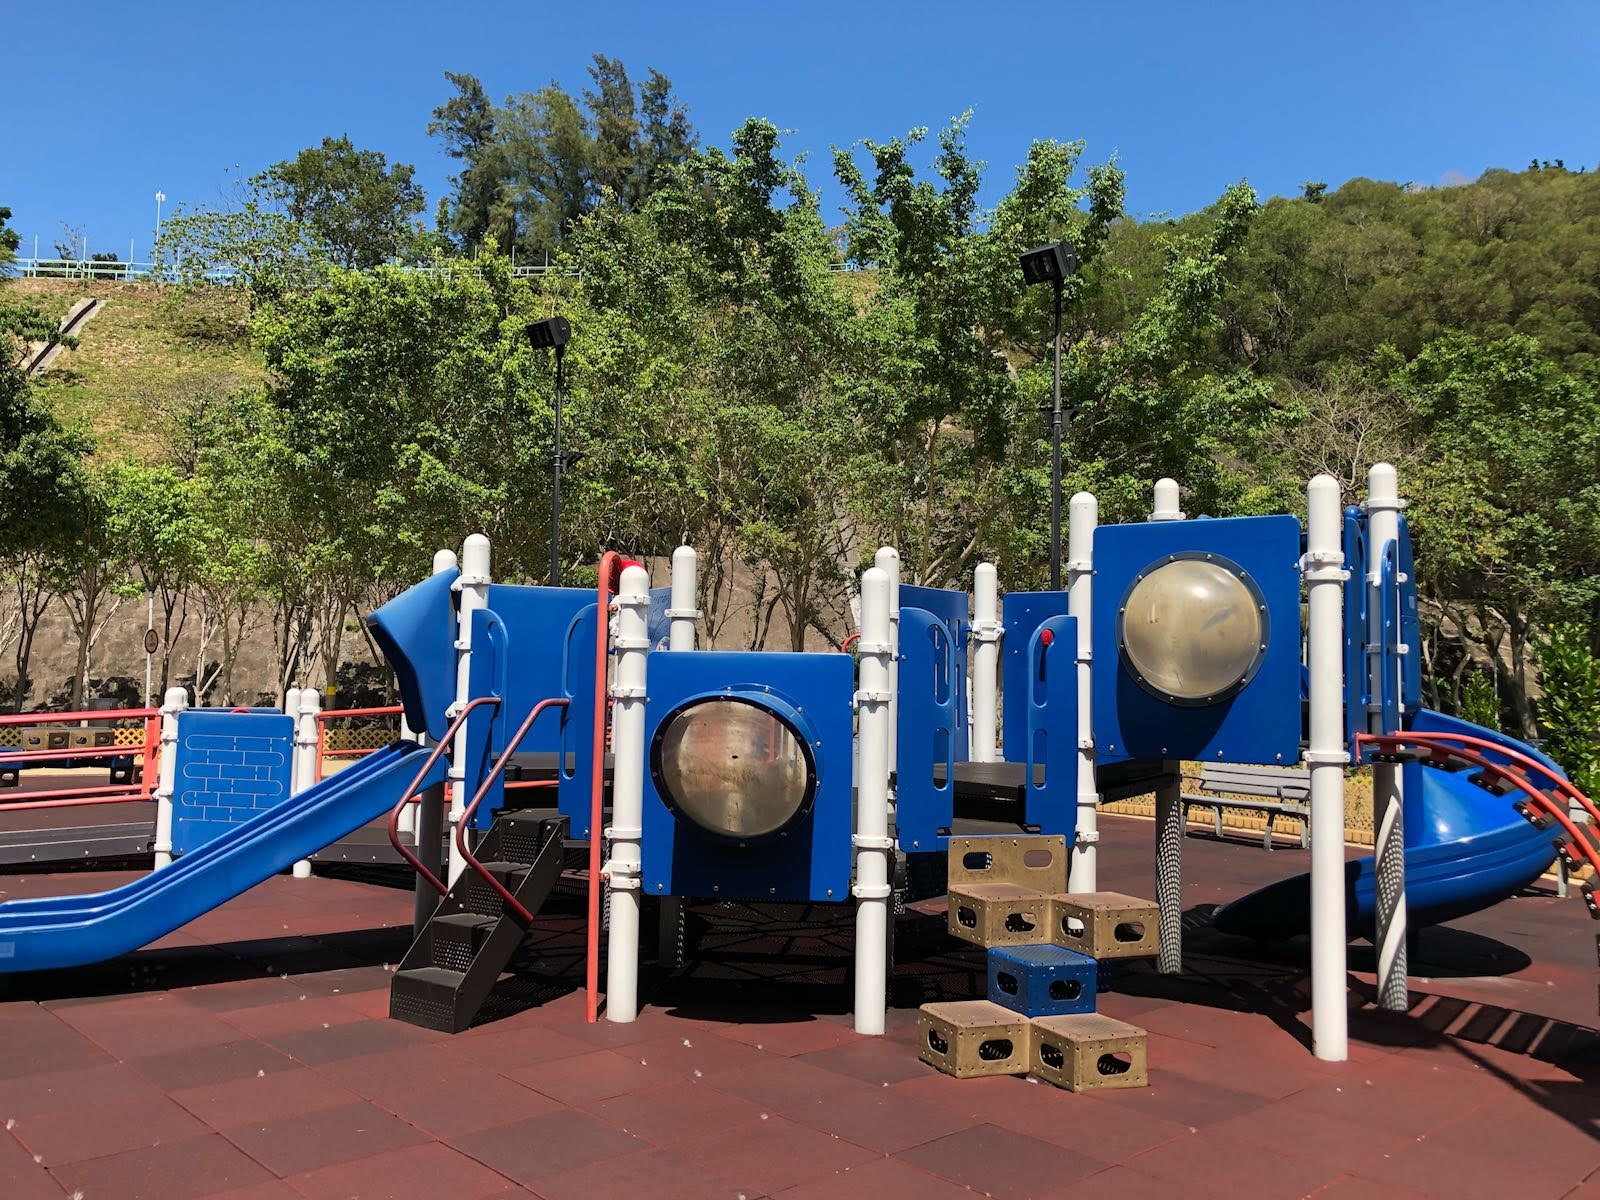 Siu Sai Wan Promenade's obstacle maze at playground